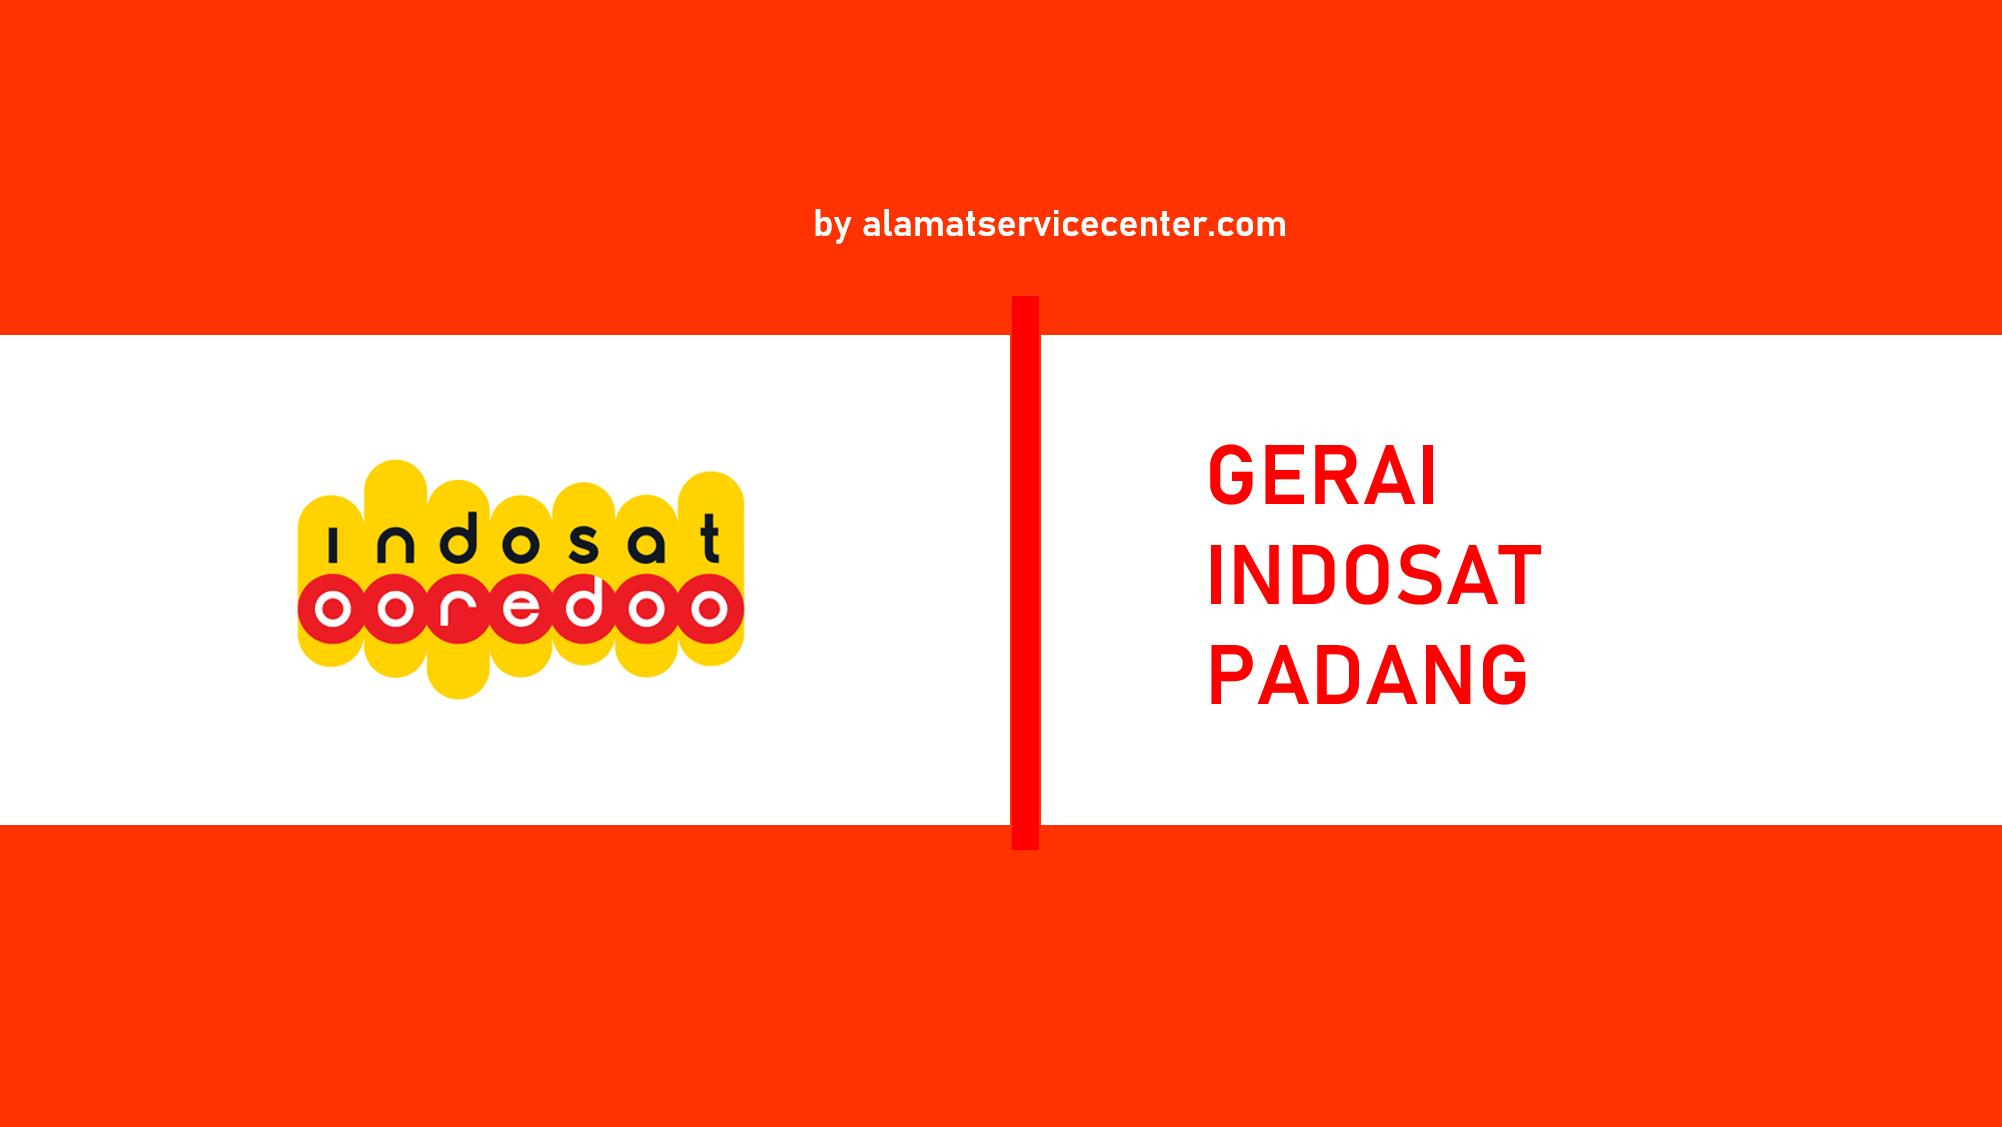 Gerai Indosat Padang